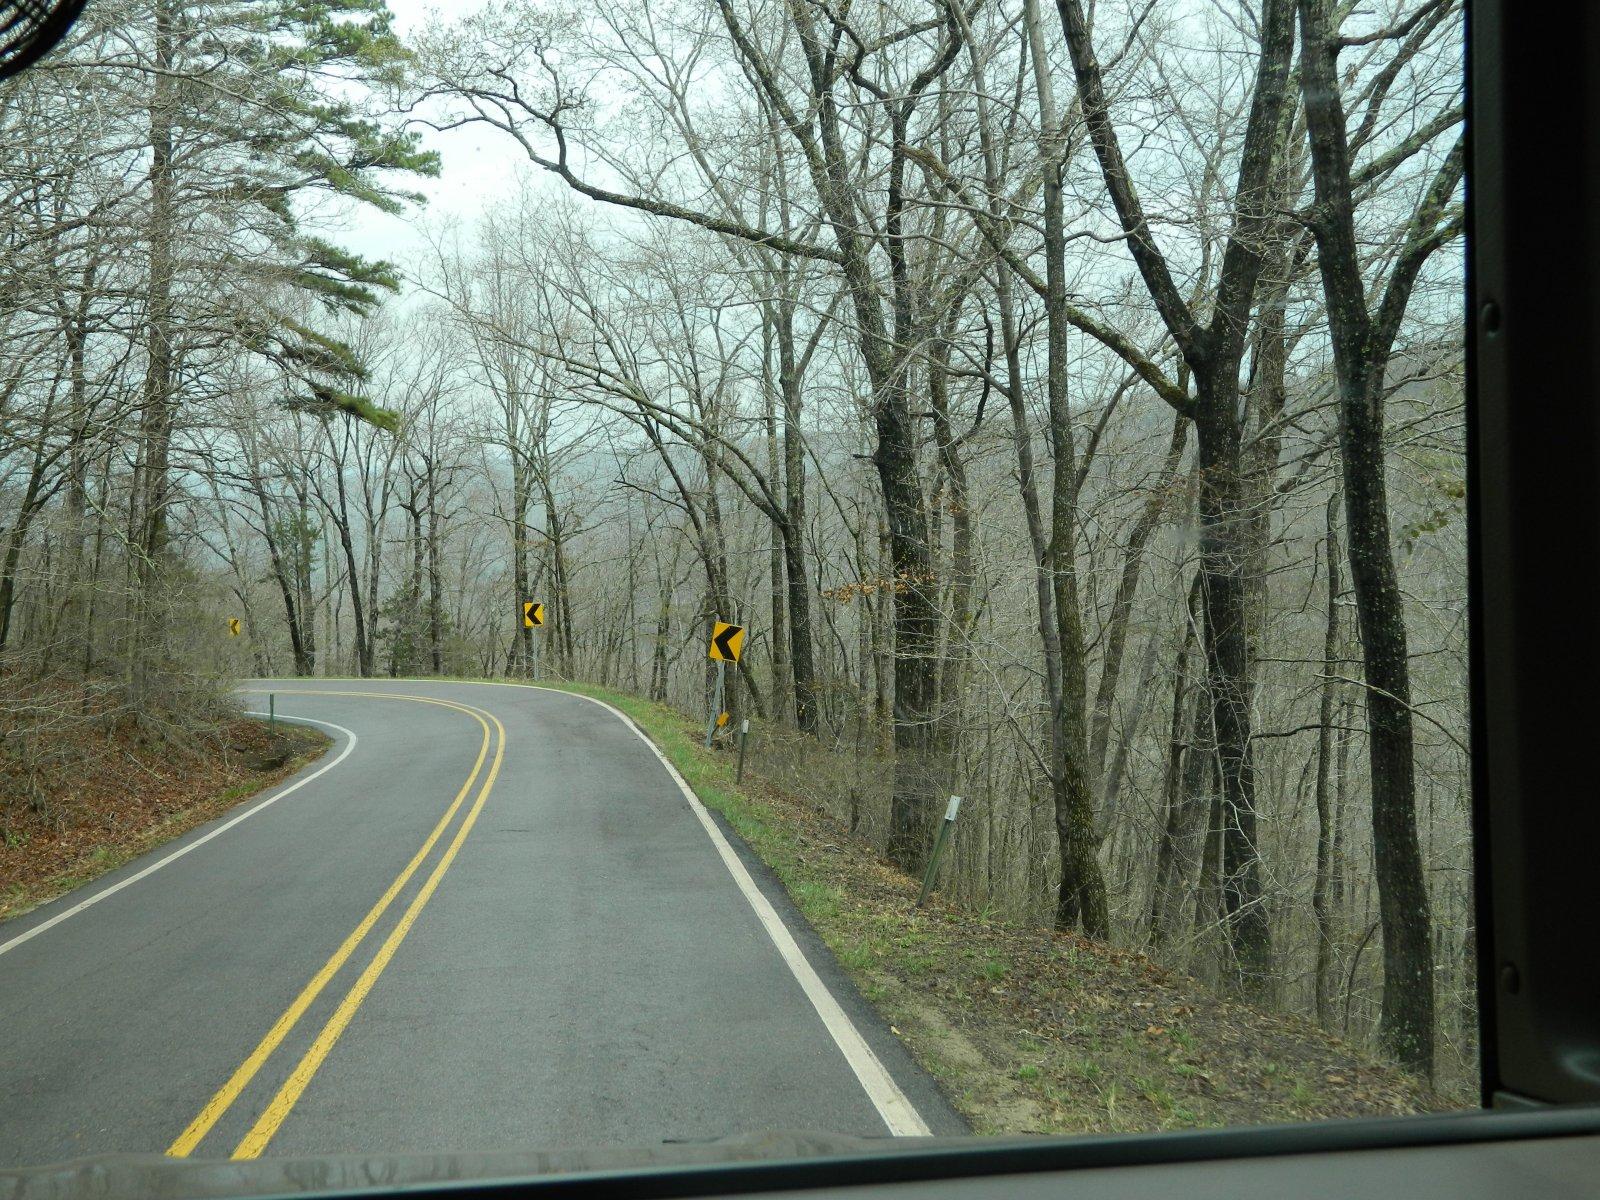 Click image for larger version  Name:Arkansas Trip 2014 290.jpg Views:108 Size:583.7 KB ID:88030